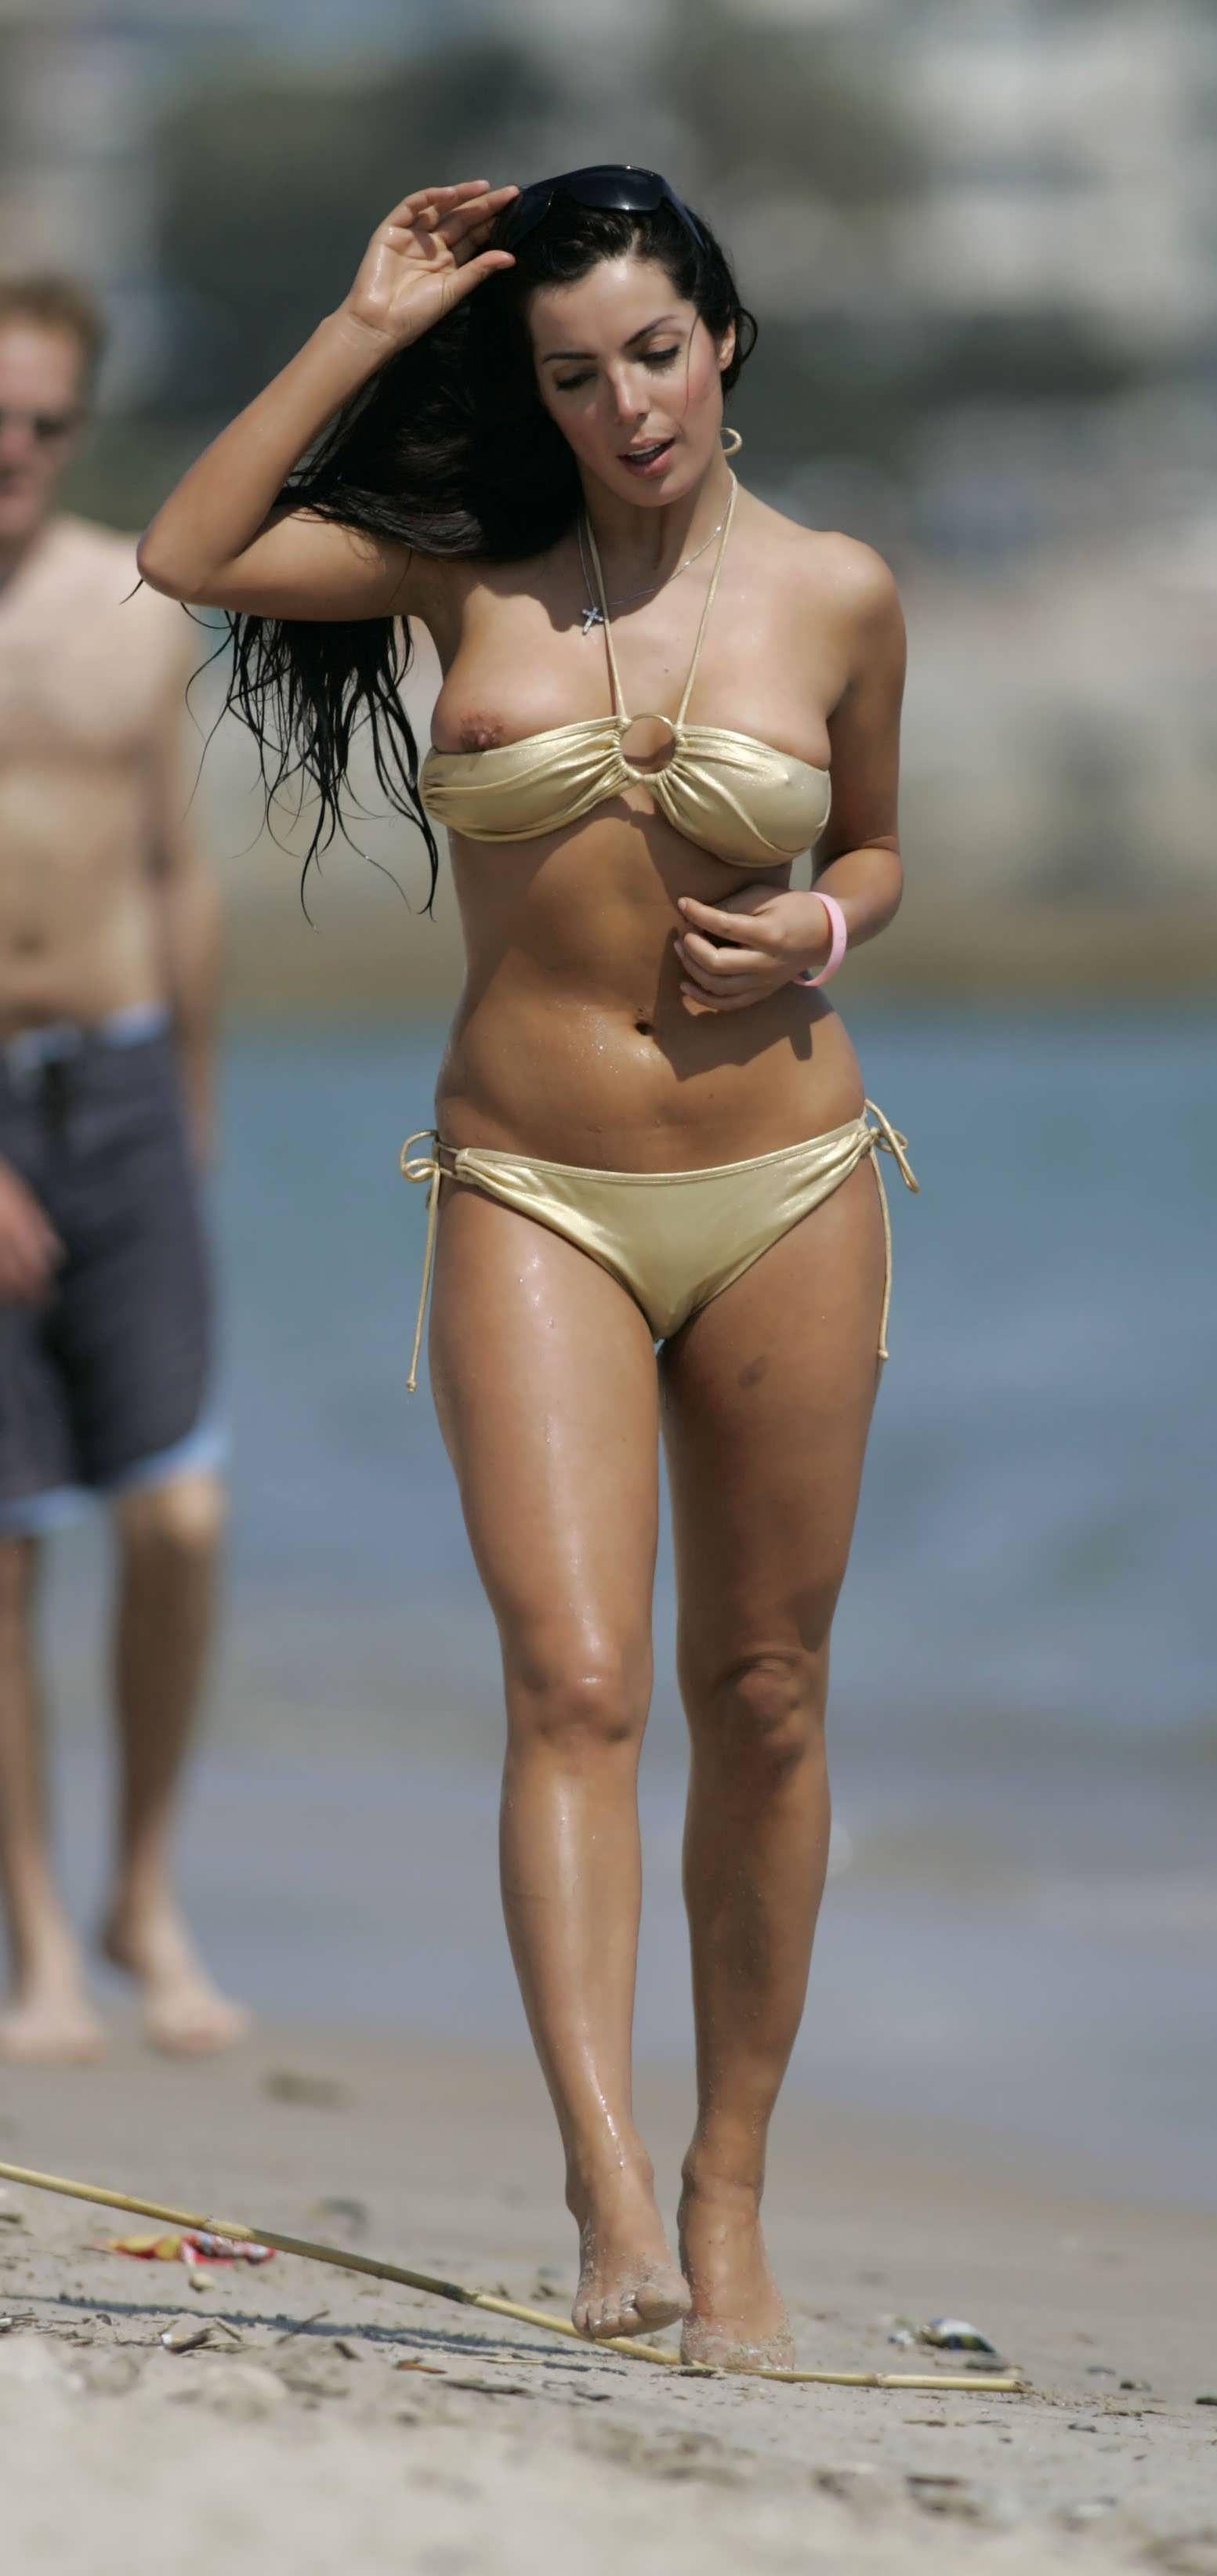 Slip stream bikini